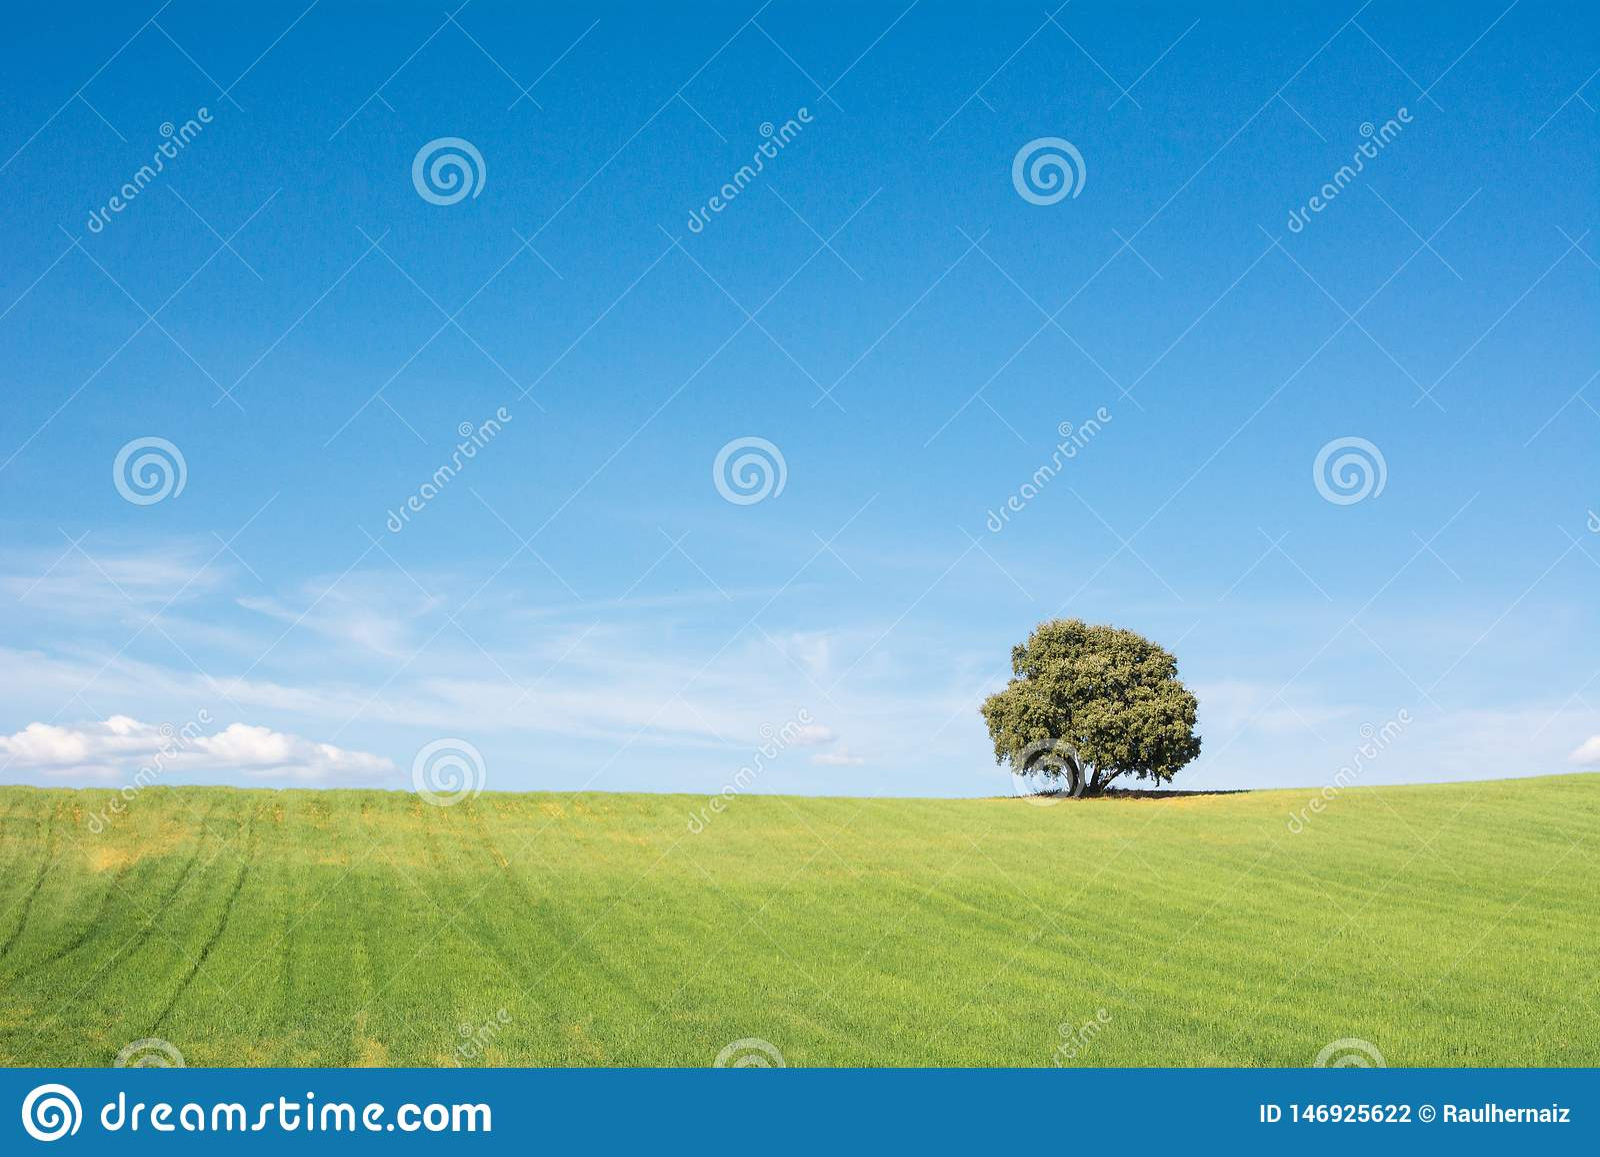 Albero isolato su un campo verde, sotto un cielo blu pulito